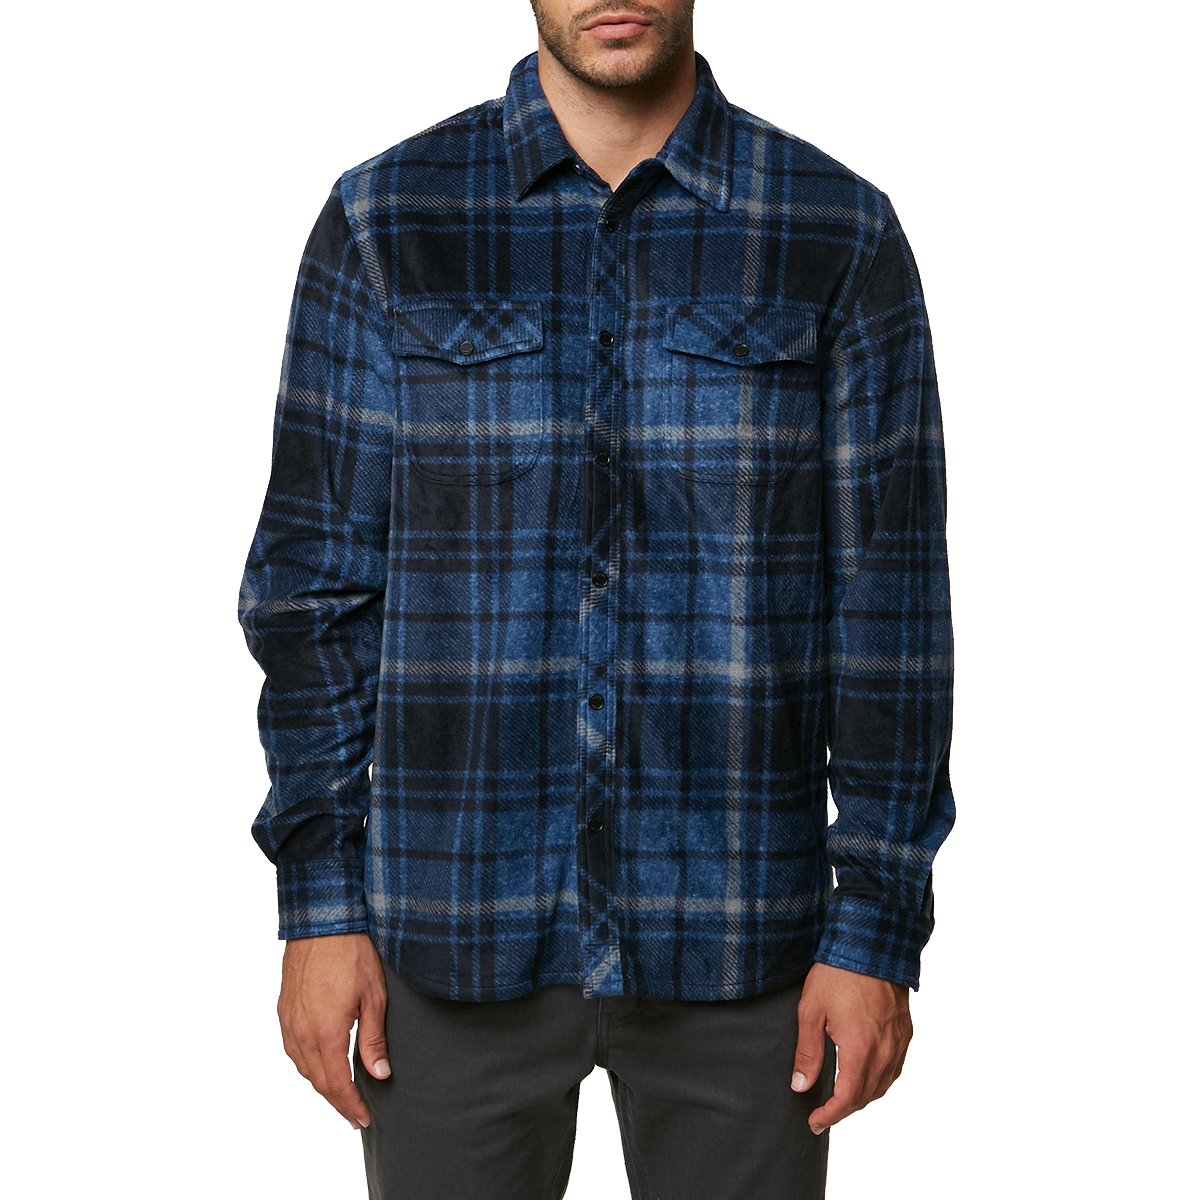 O'neill Guys' Glacier Plaid Long-Sleeve Shirt - Blue, L